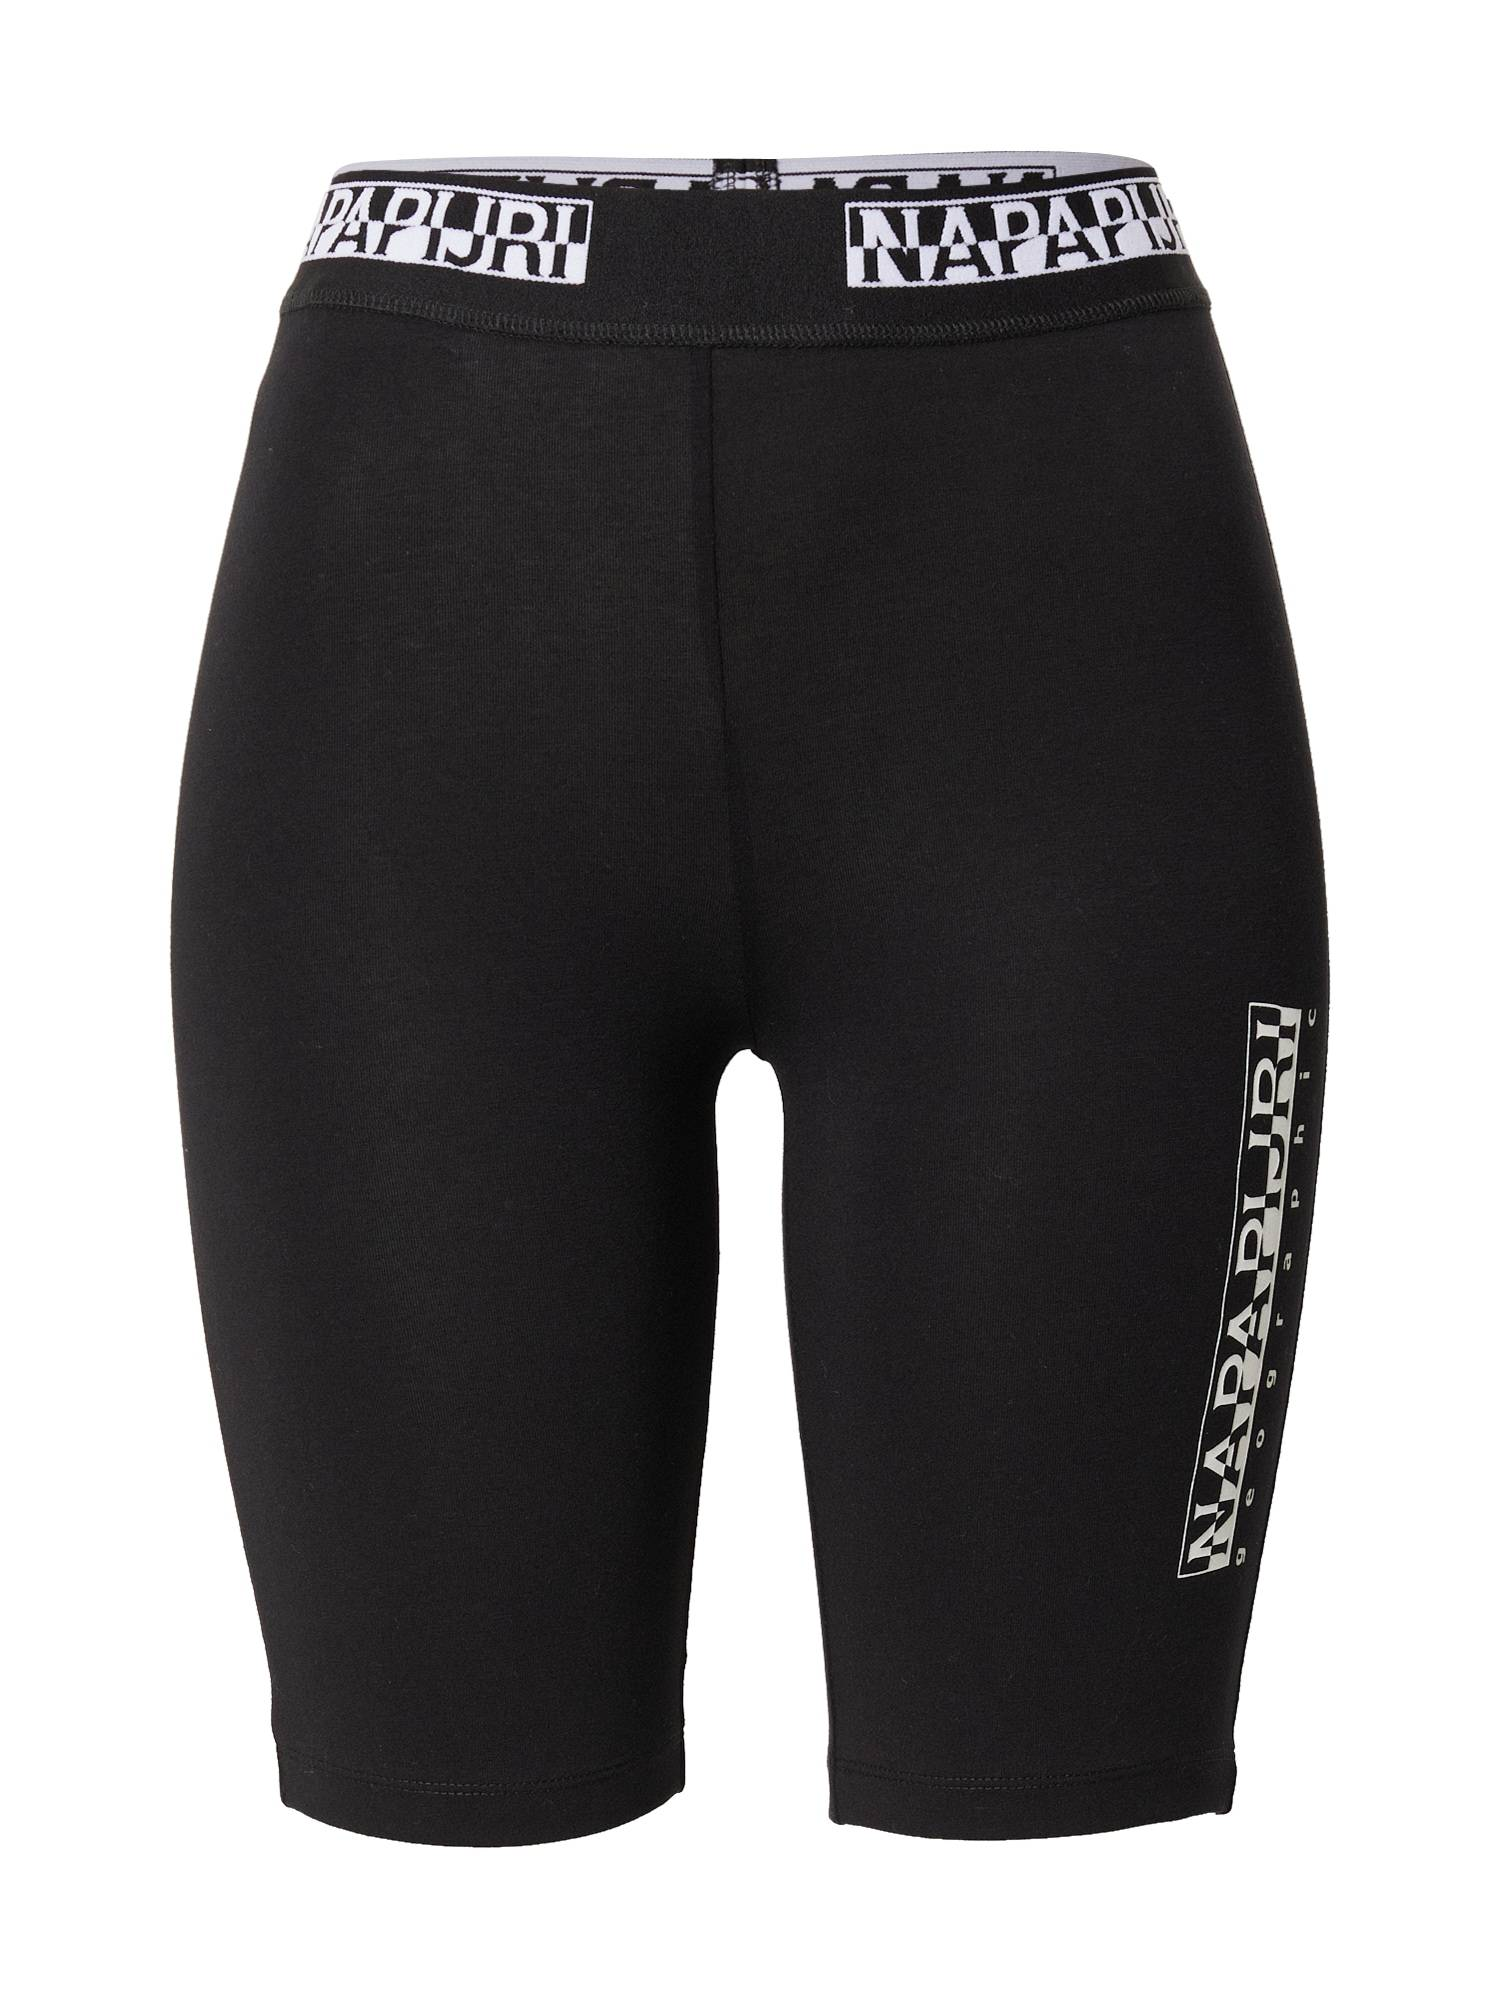 NAPAPIJRI Leggings 'N-BOX'  - Noir - Taille: XL - female